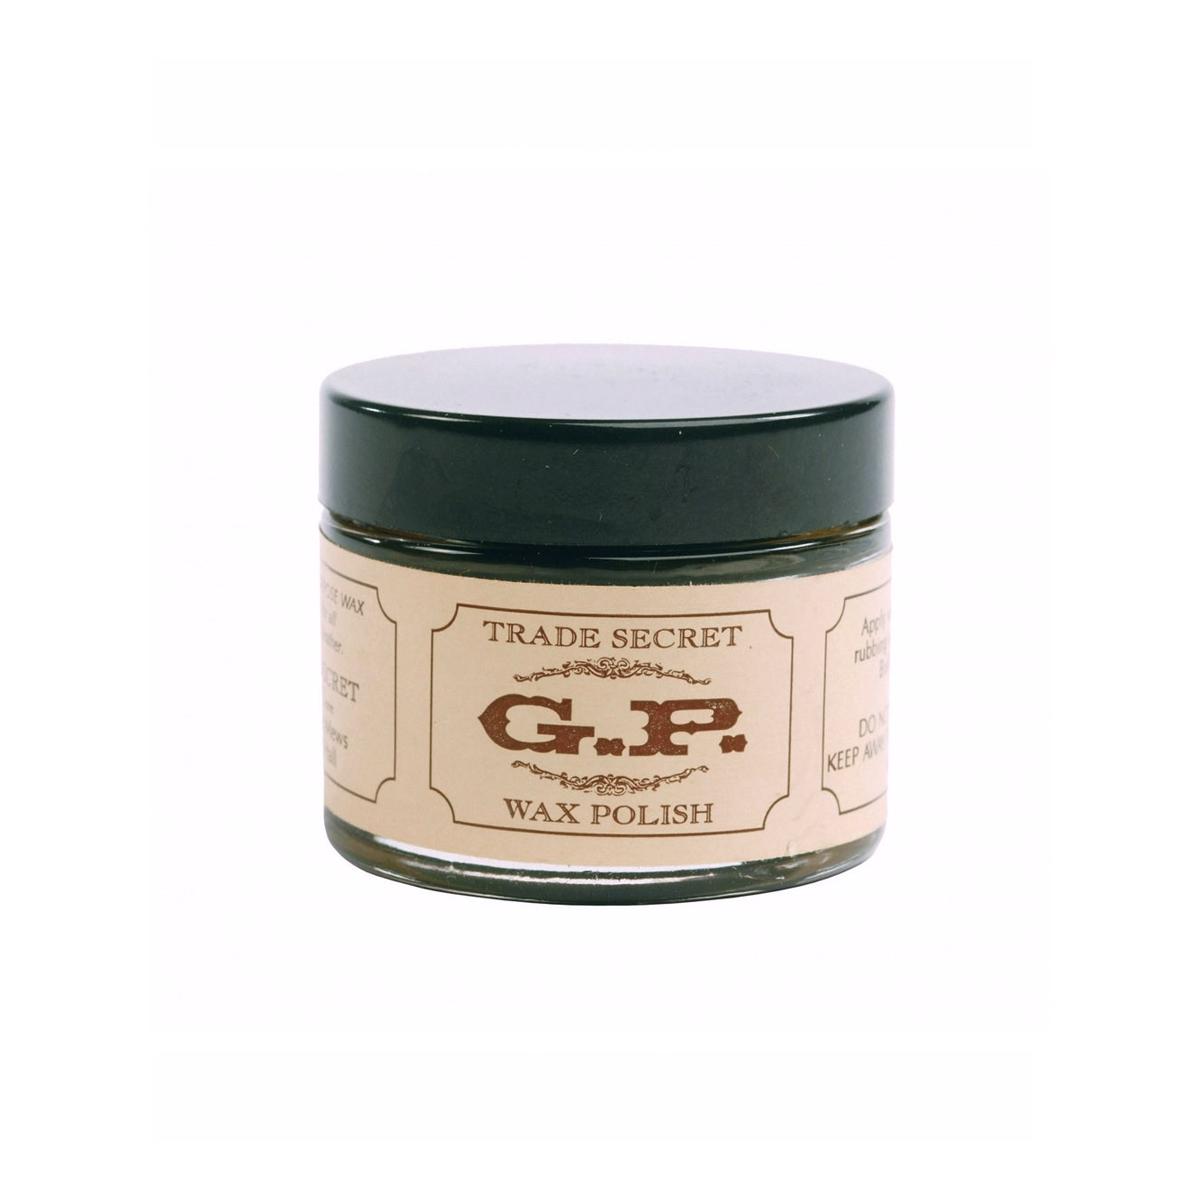 Trade Secret GP Wax Polish